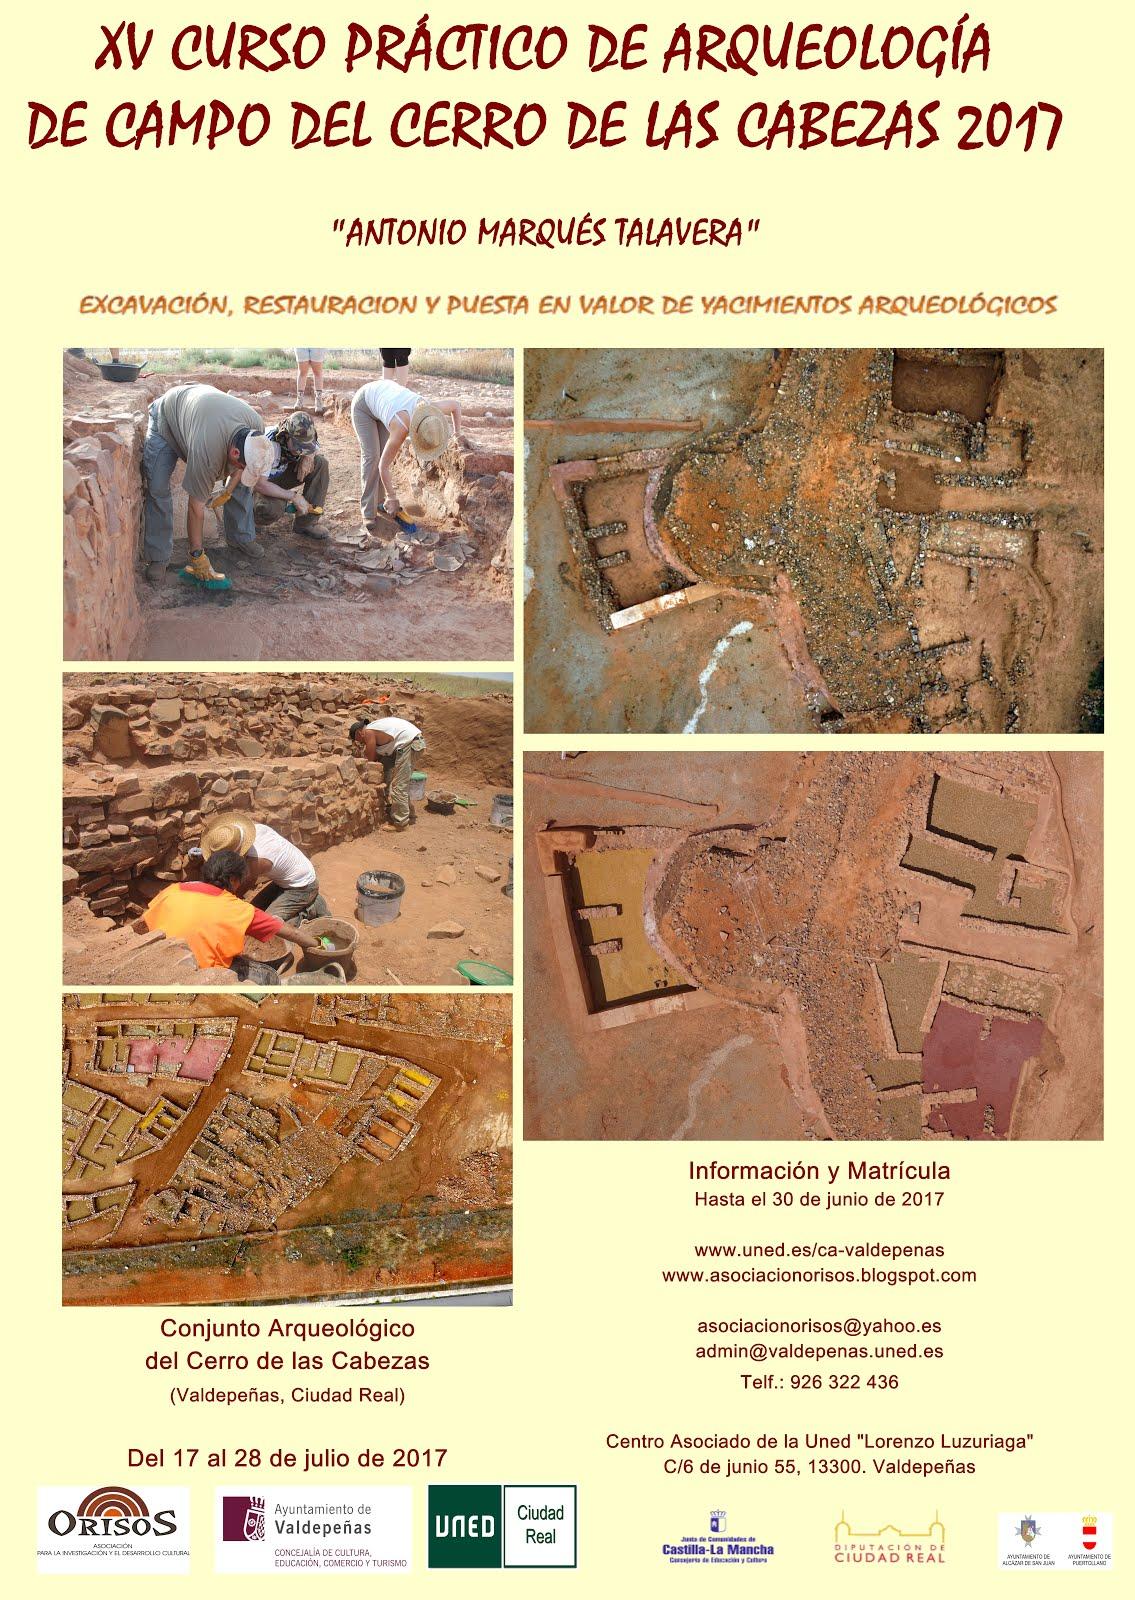 XV Curso práctico de Arqueología de Campo